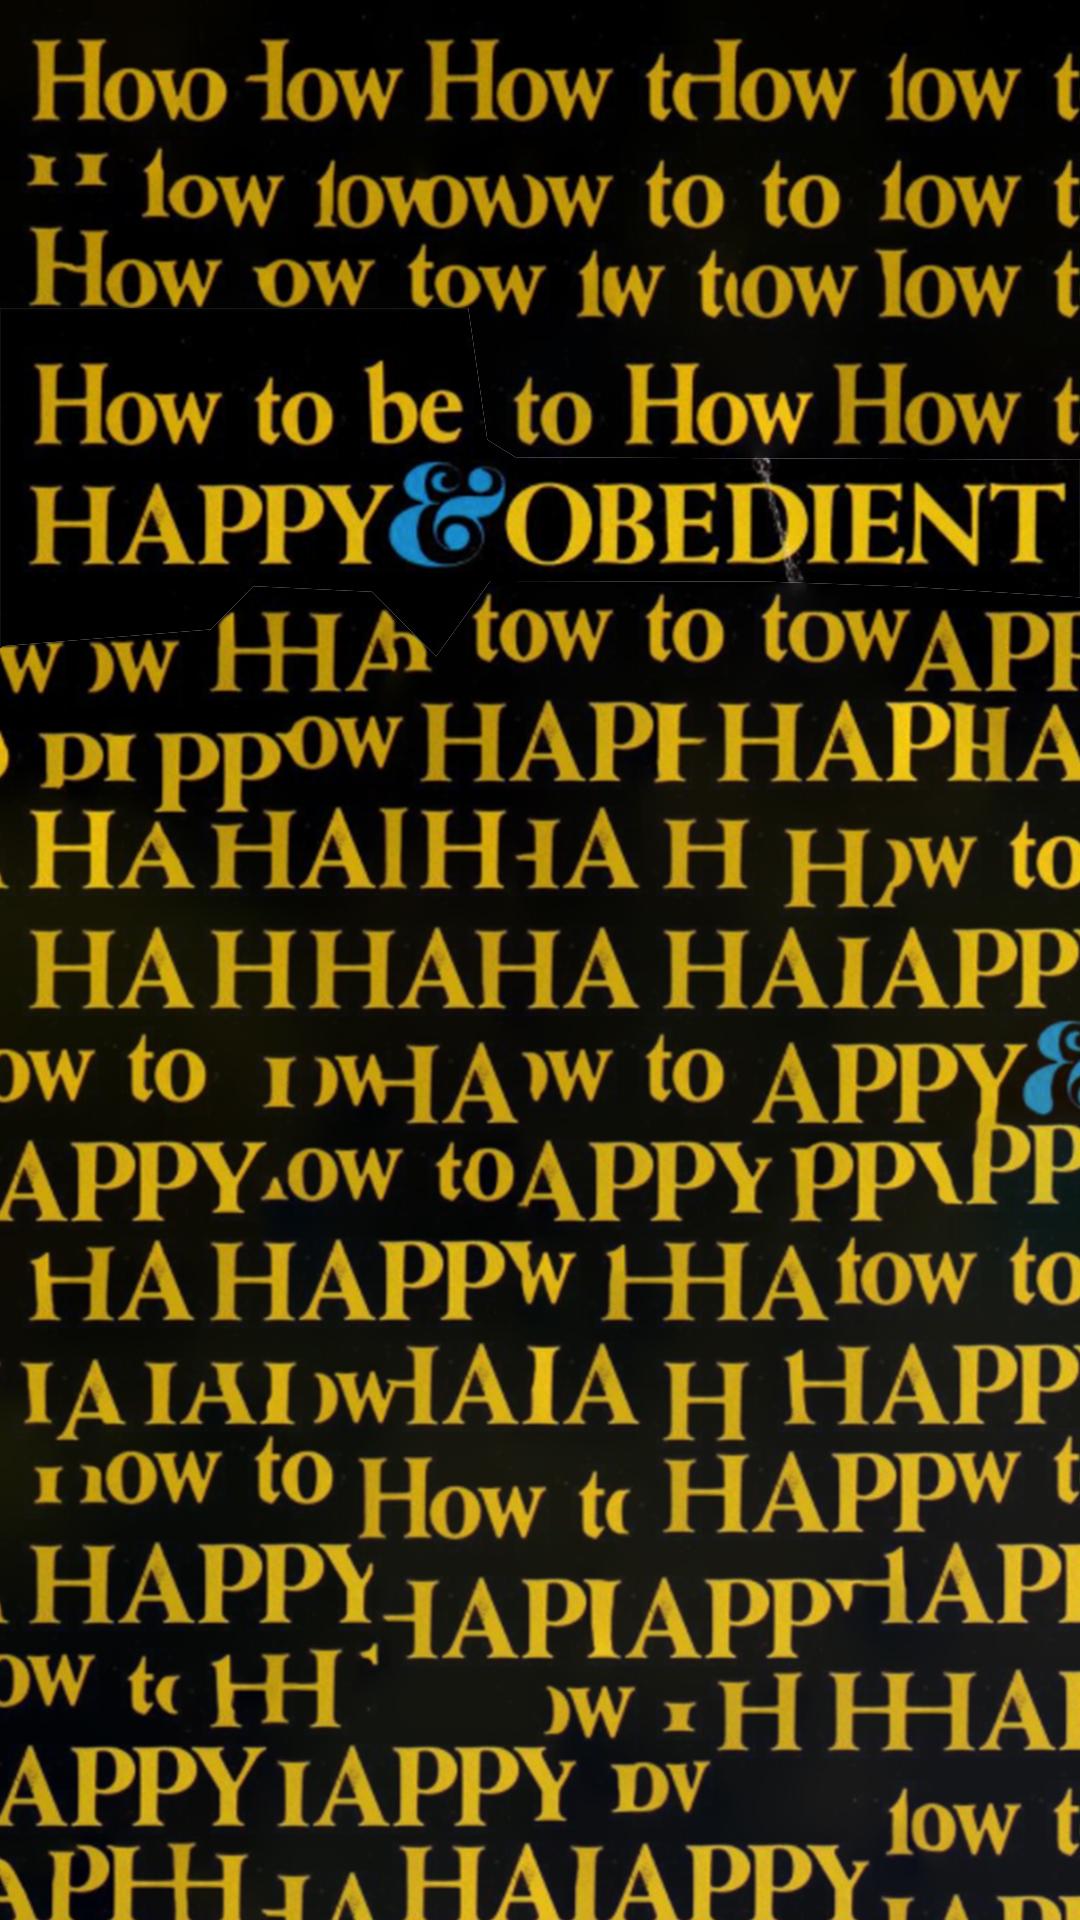 happyobedient.jpg